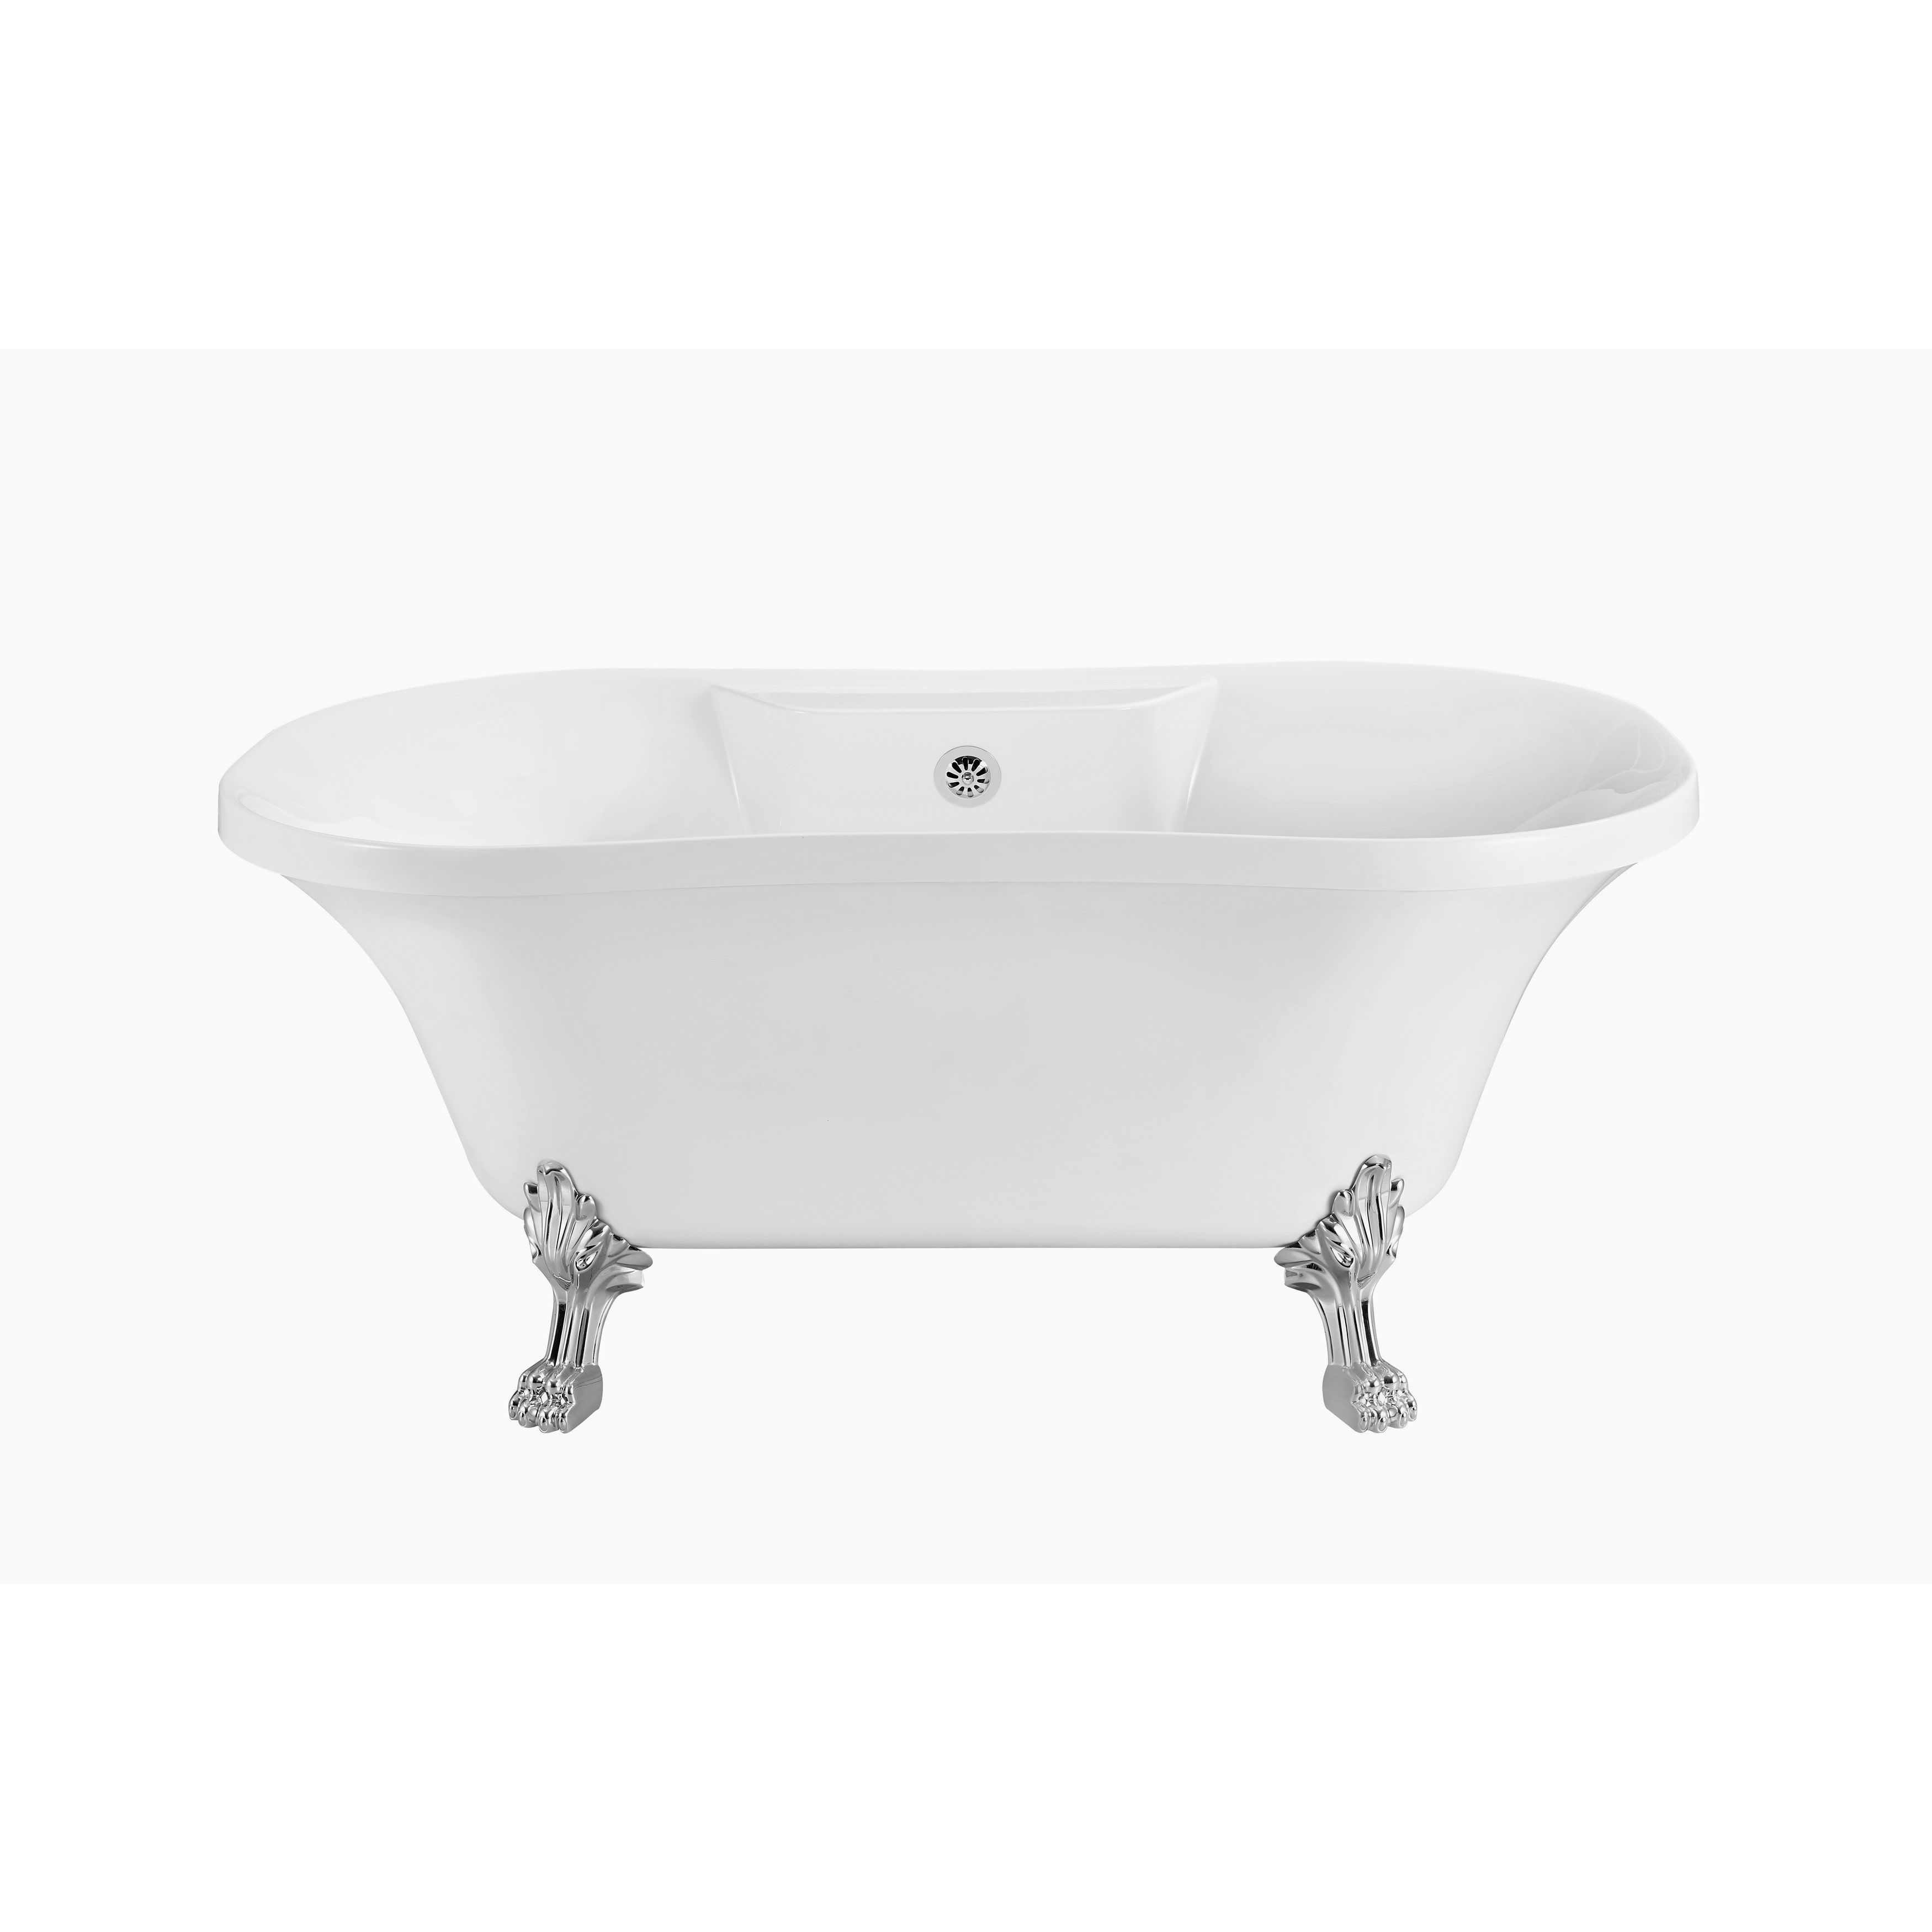 "Streamline 60"" Soaking Clawfoot Tub With External Drain"